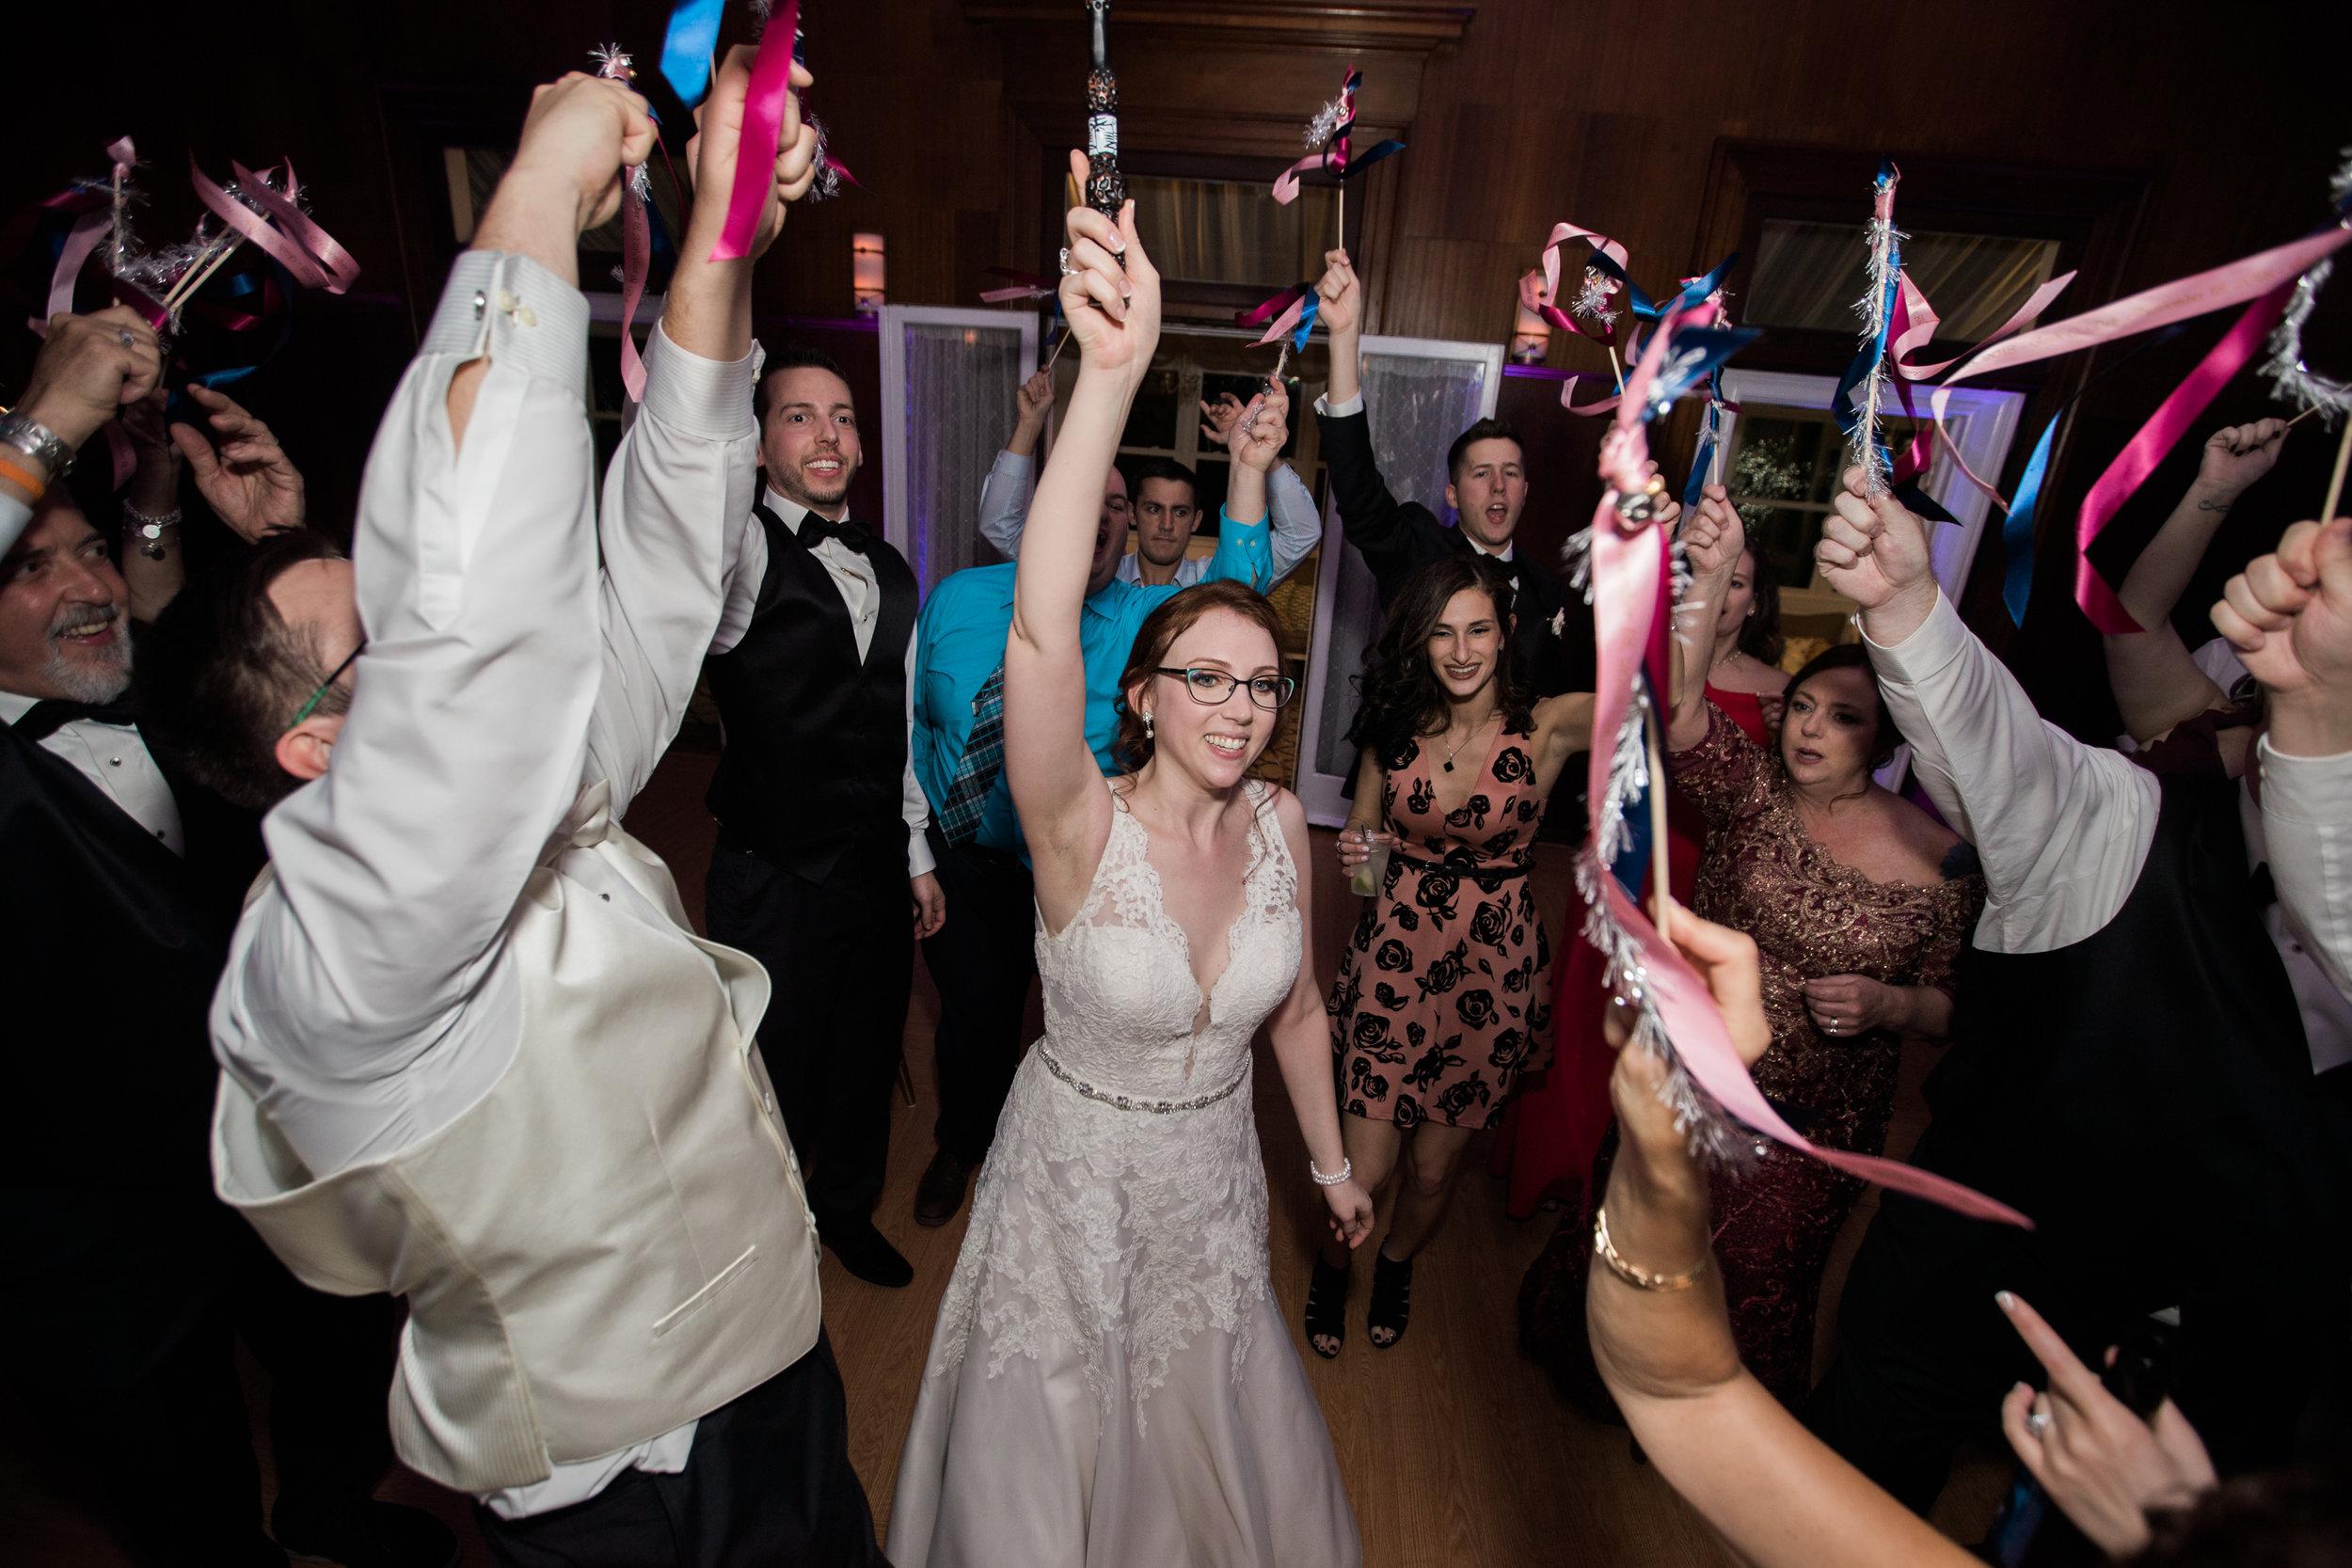 Harry Potter Wedding at Overhills Mansion Catonville Maryland Wedding Photographers Megapixels Media (131 of 134).jpg